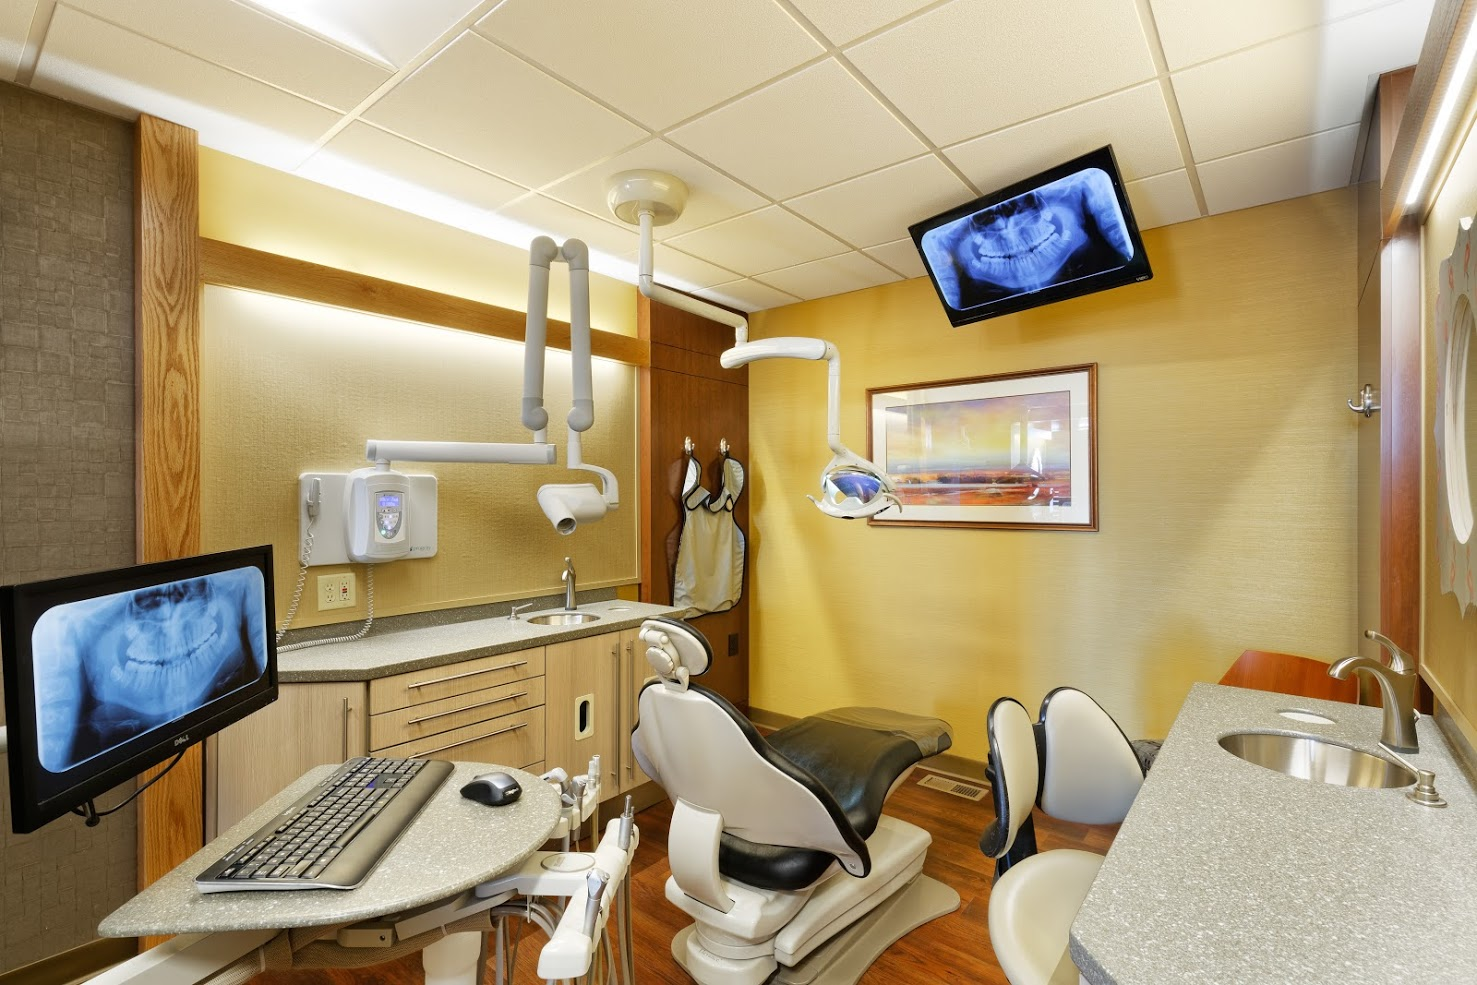 Testerman Dental image 5